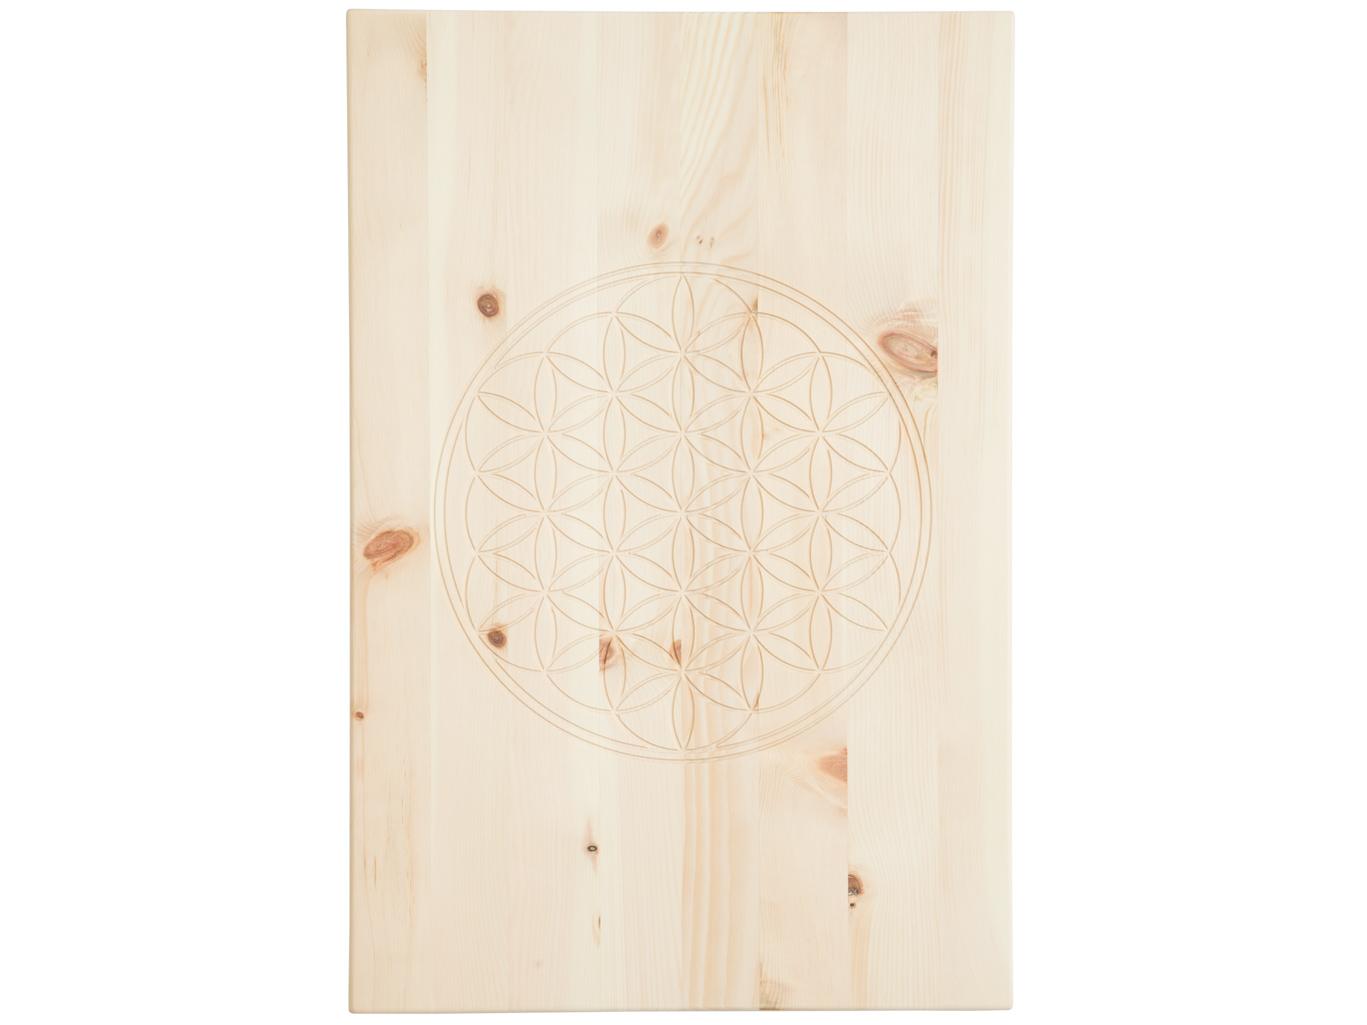 Wandbild aus Zirbenholz 40 x 60 cm